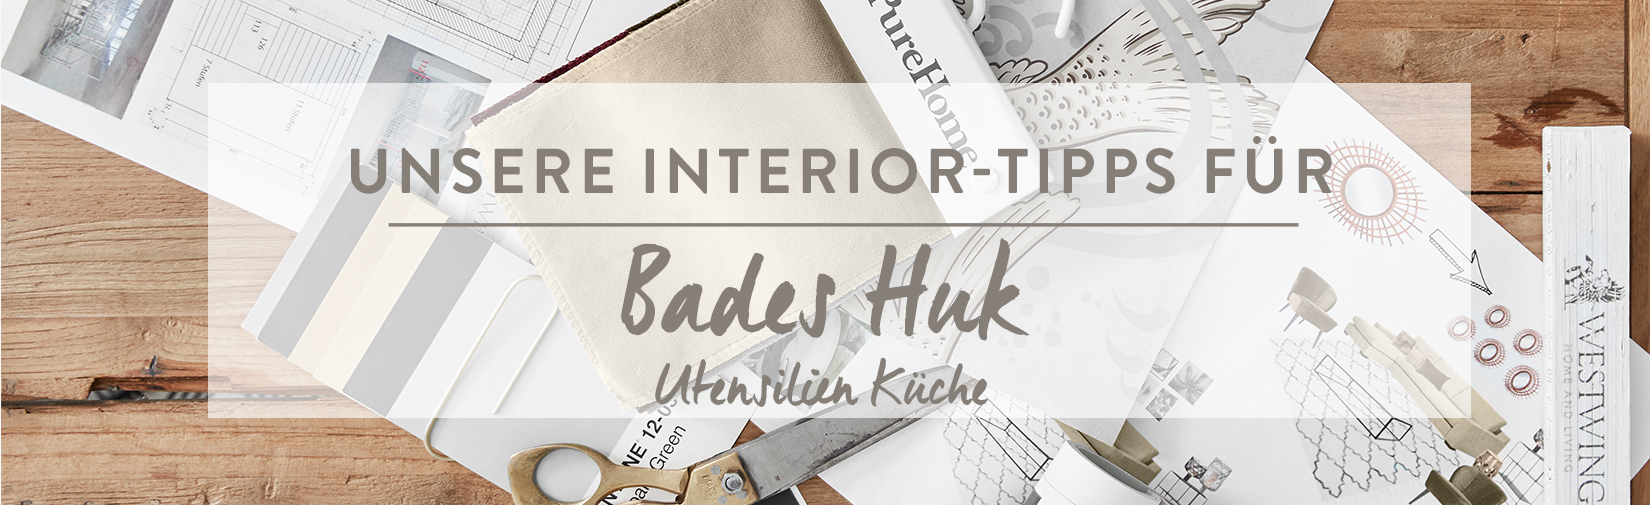 Bades_Huk_Utensilien_Küche_desktop